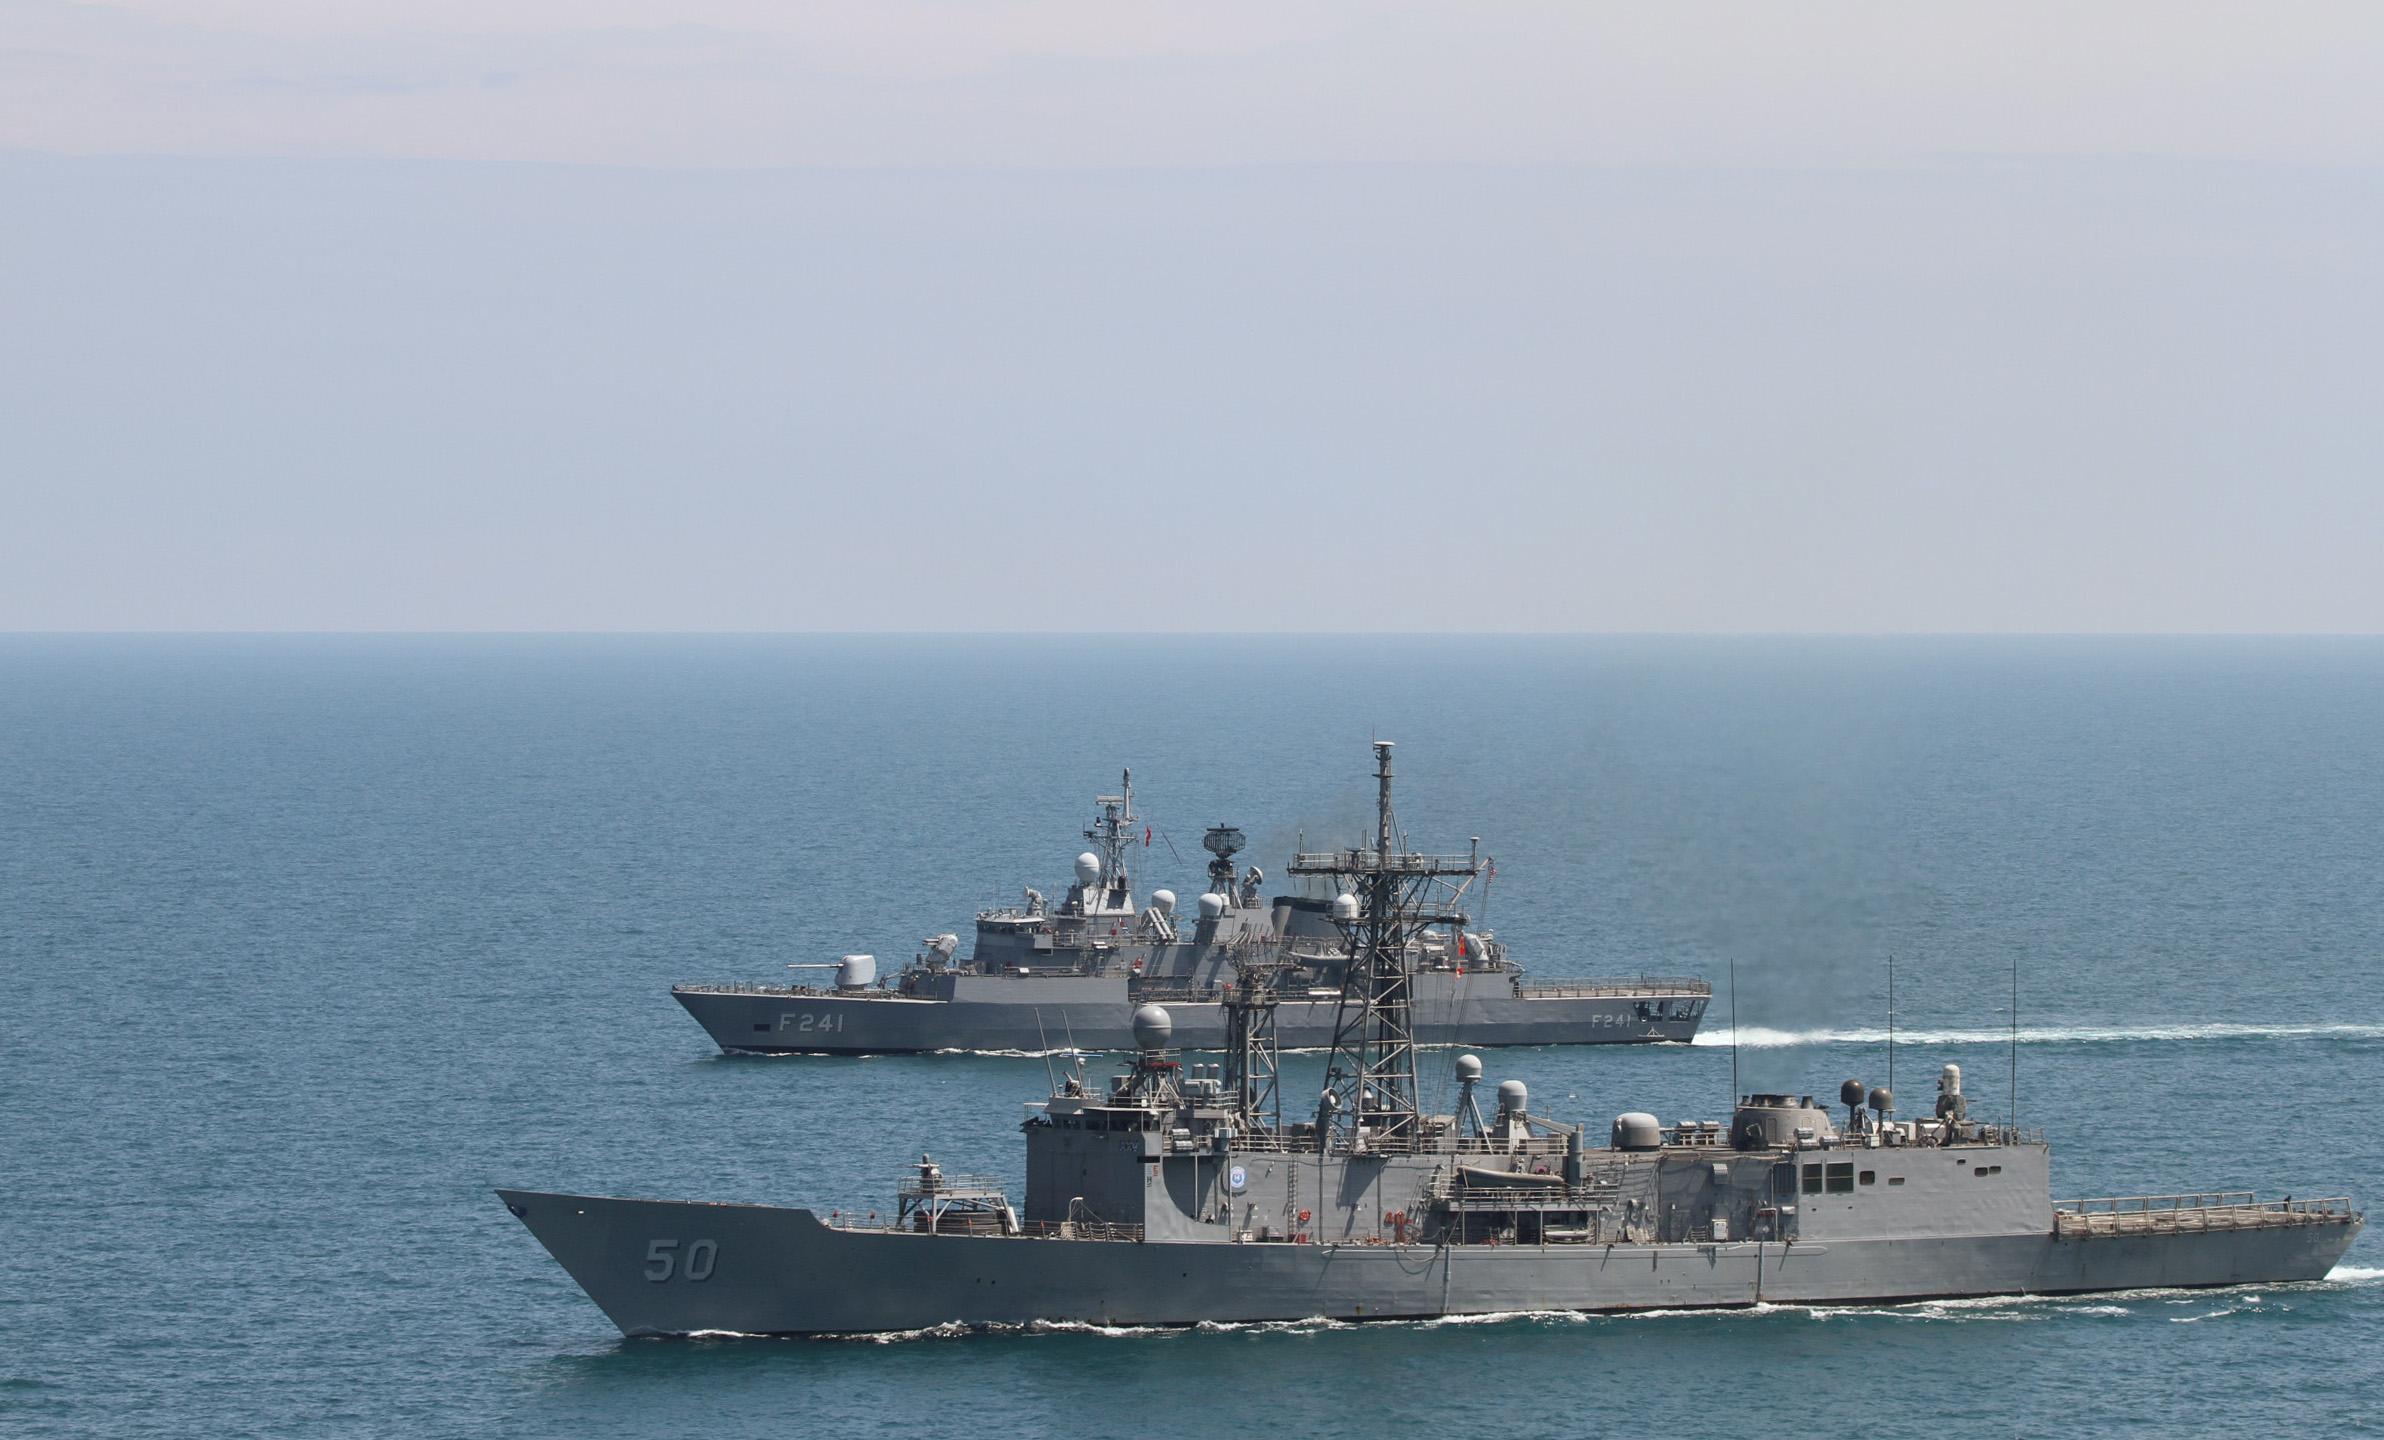 USS Taylor (FFG-50) and the Turkish frigate TCG Turgutries (F-241) on May 11, 2014. US Navy Photo